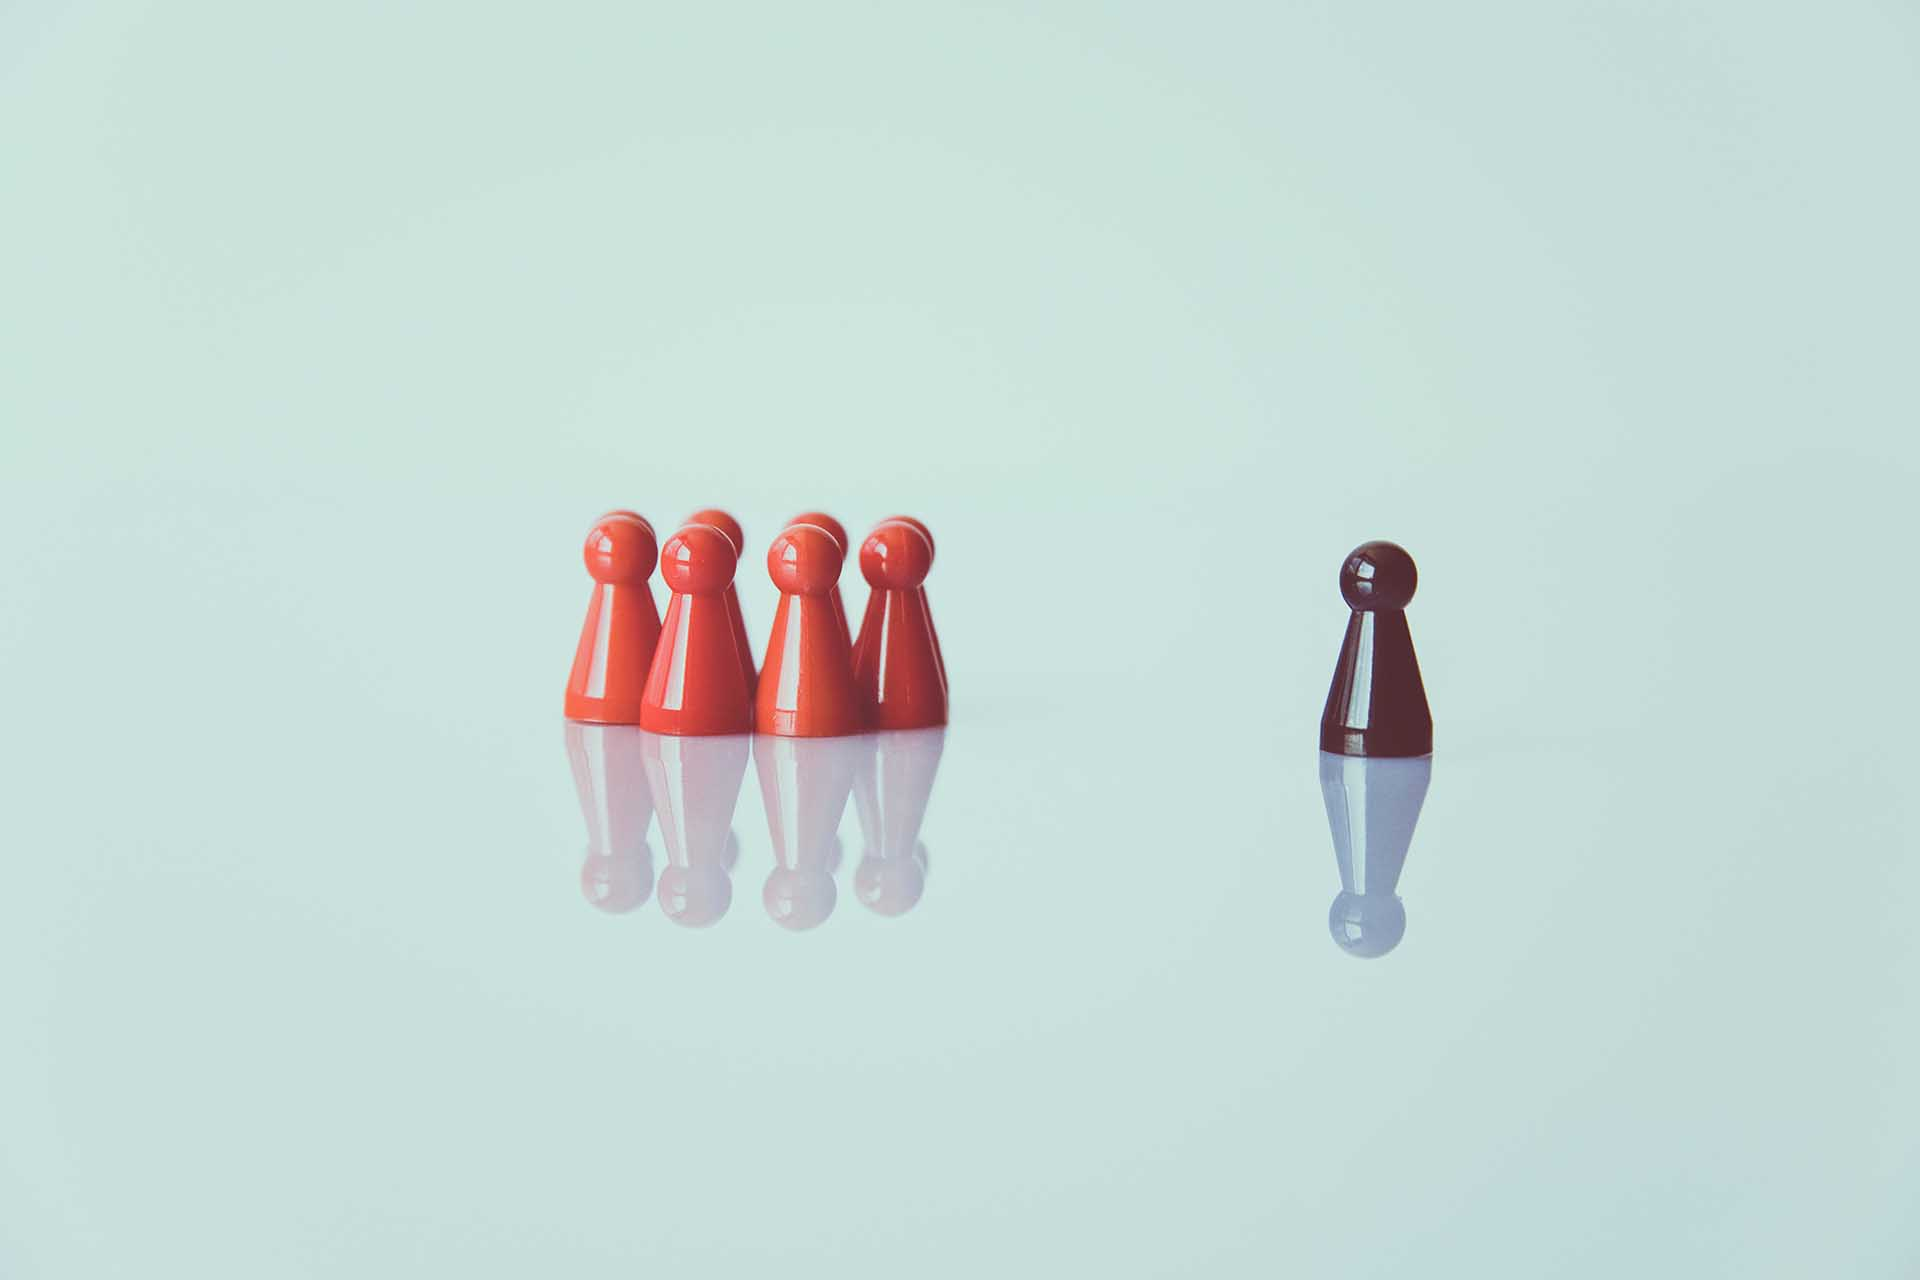 t2informatik Blog: Modern leadership: When nothing works as planned